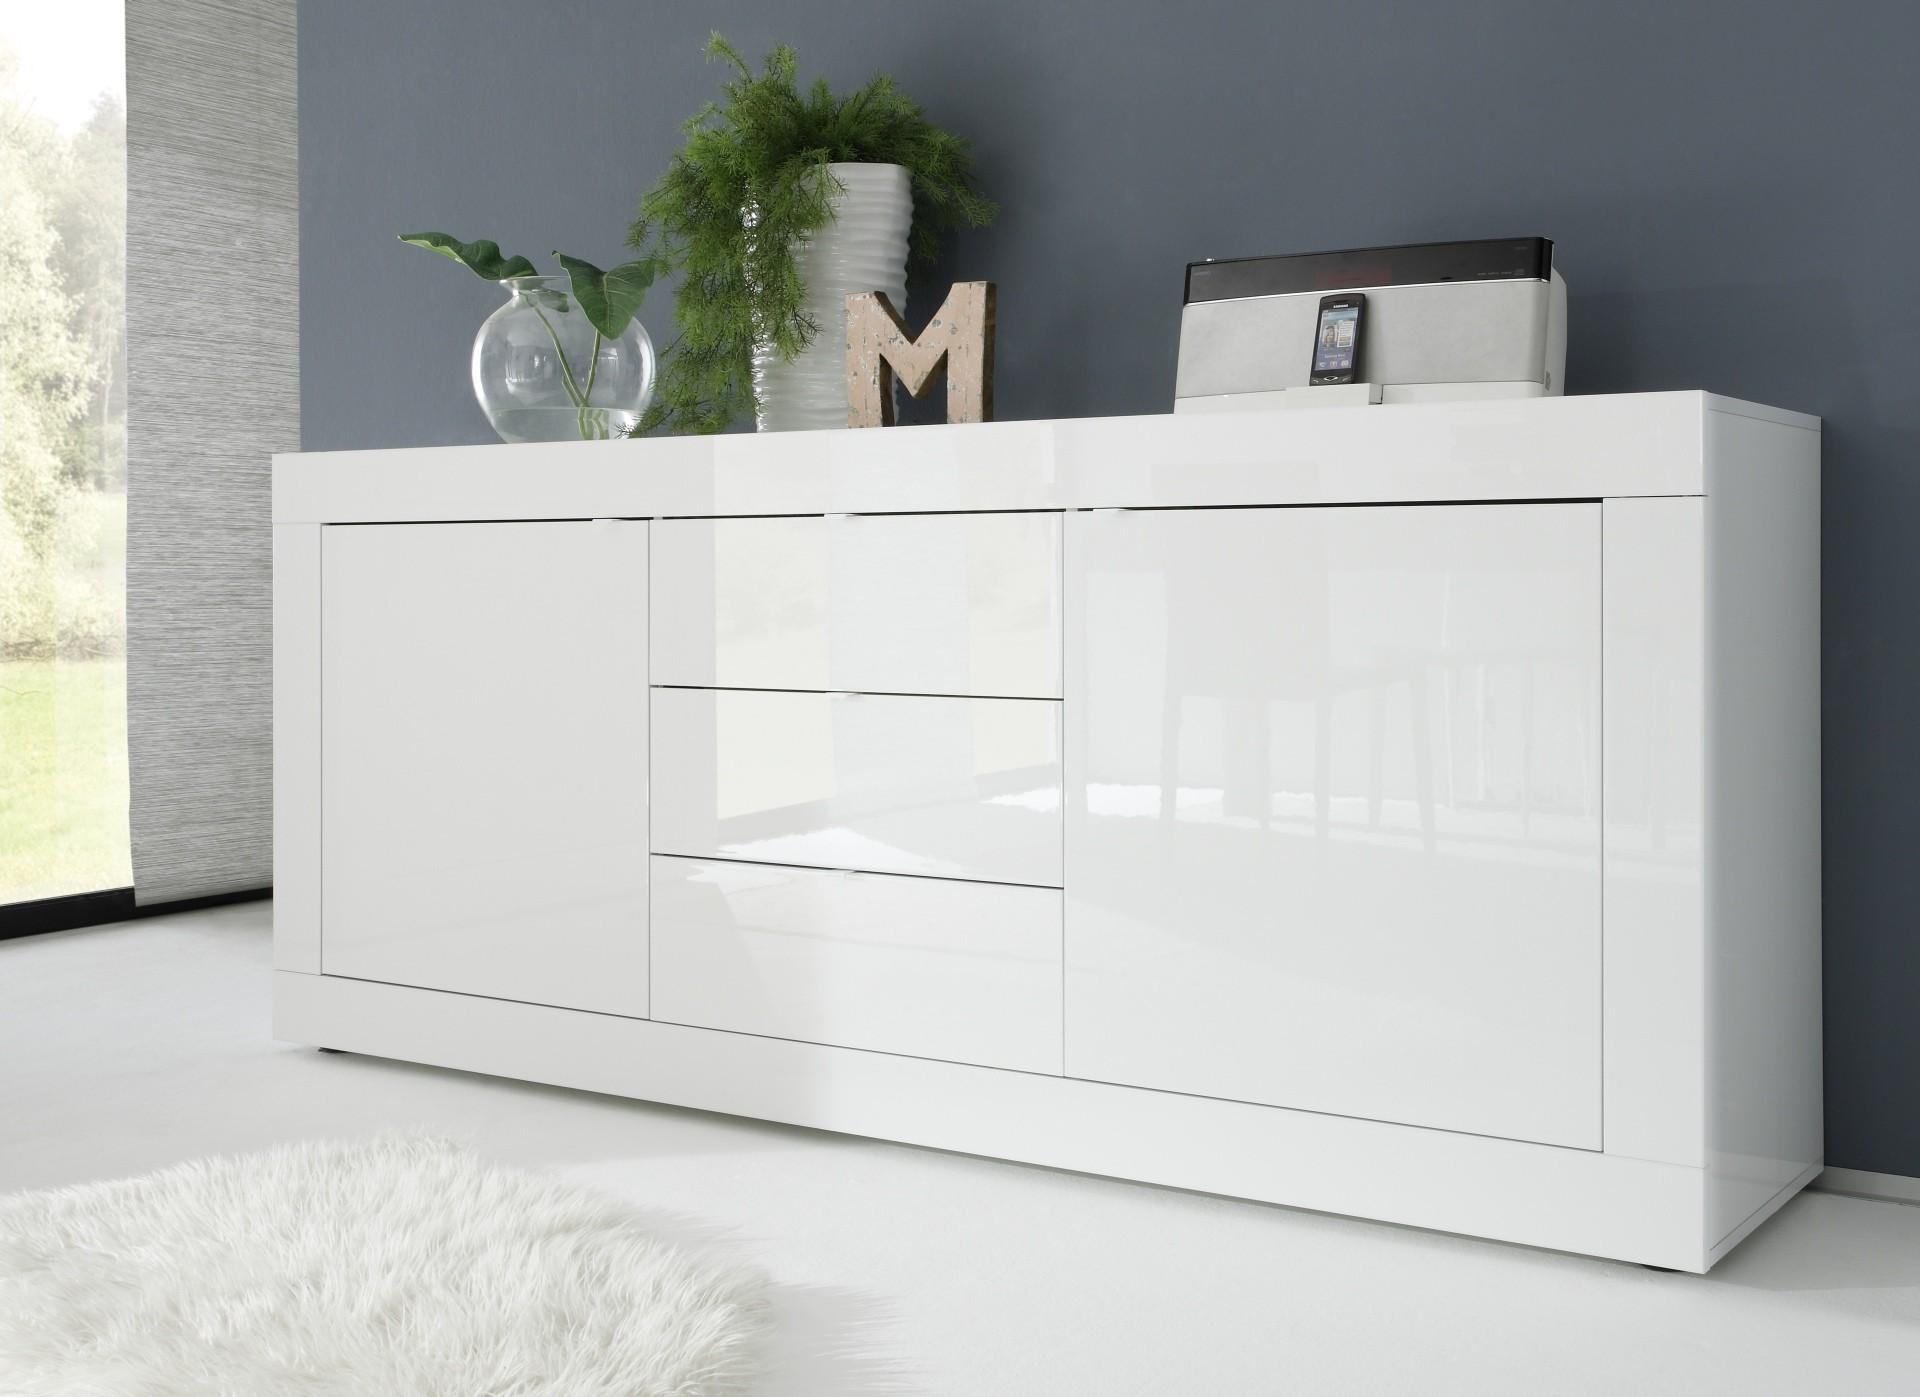 Buffet de salle a manger moderne bahut blanc en enfilade - Bahut blanc laque design ...